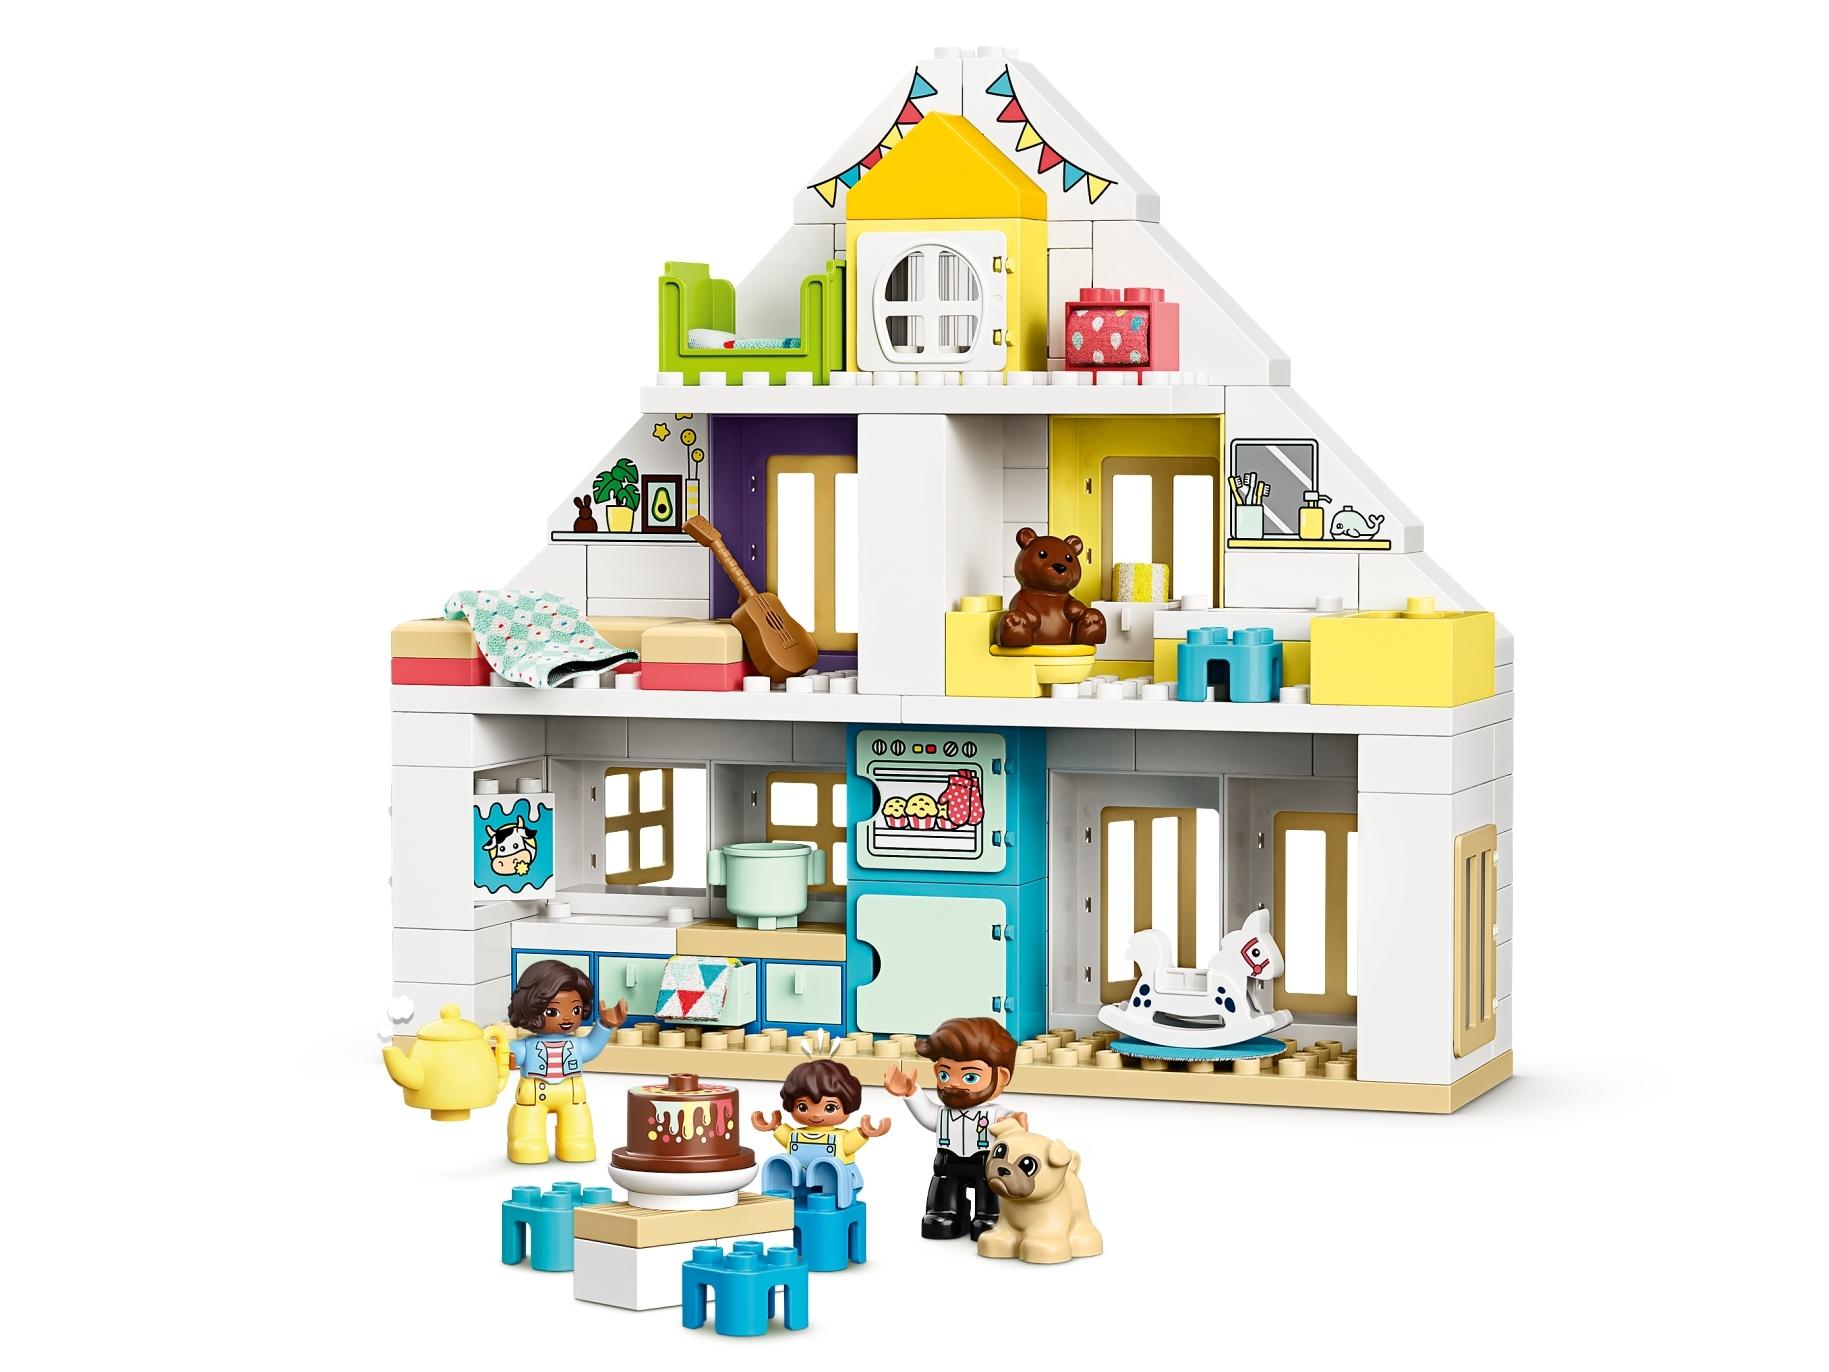 2 lego duplo vintage special window building farm architecture room house